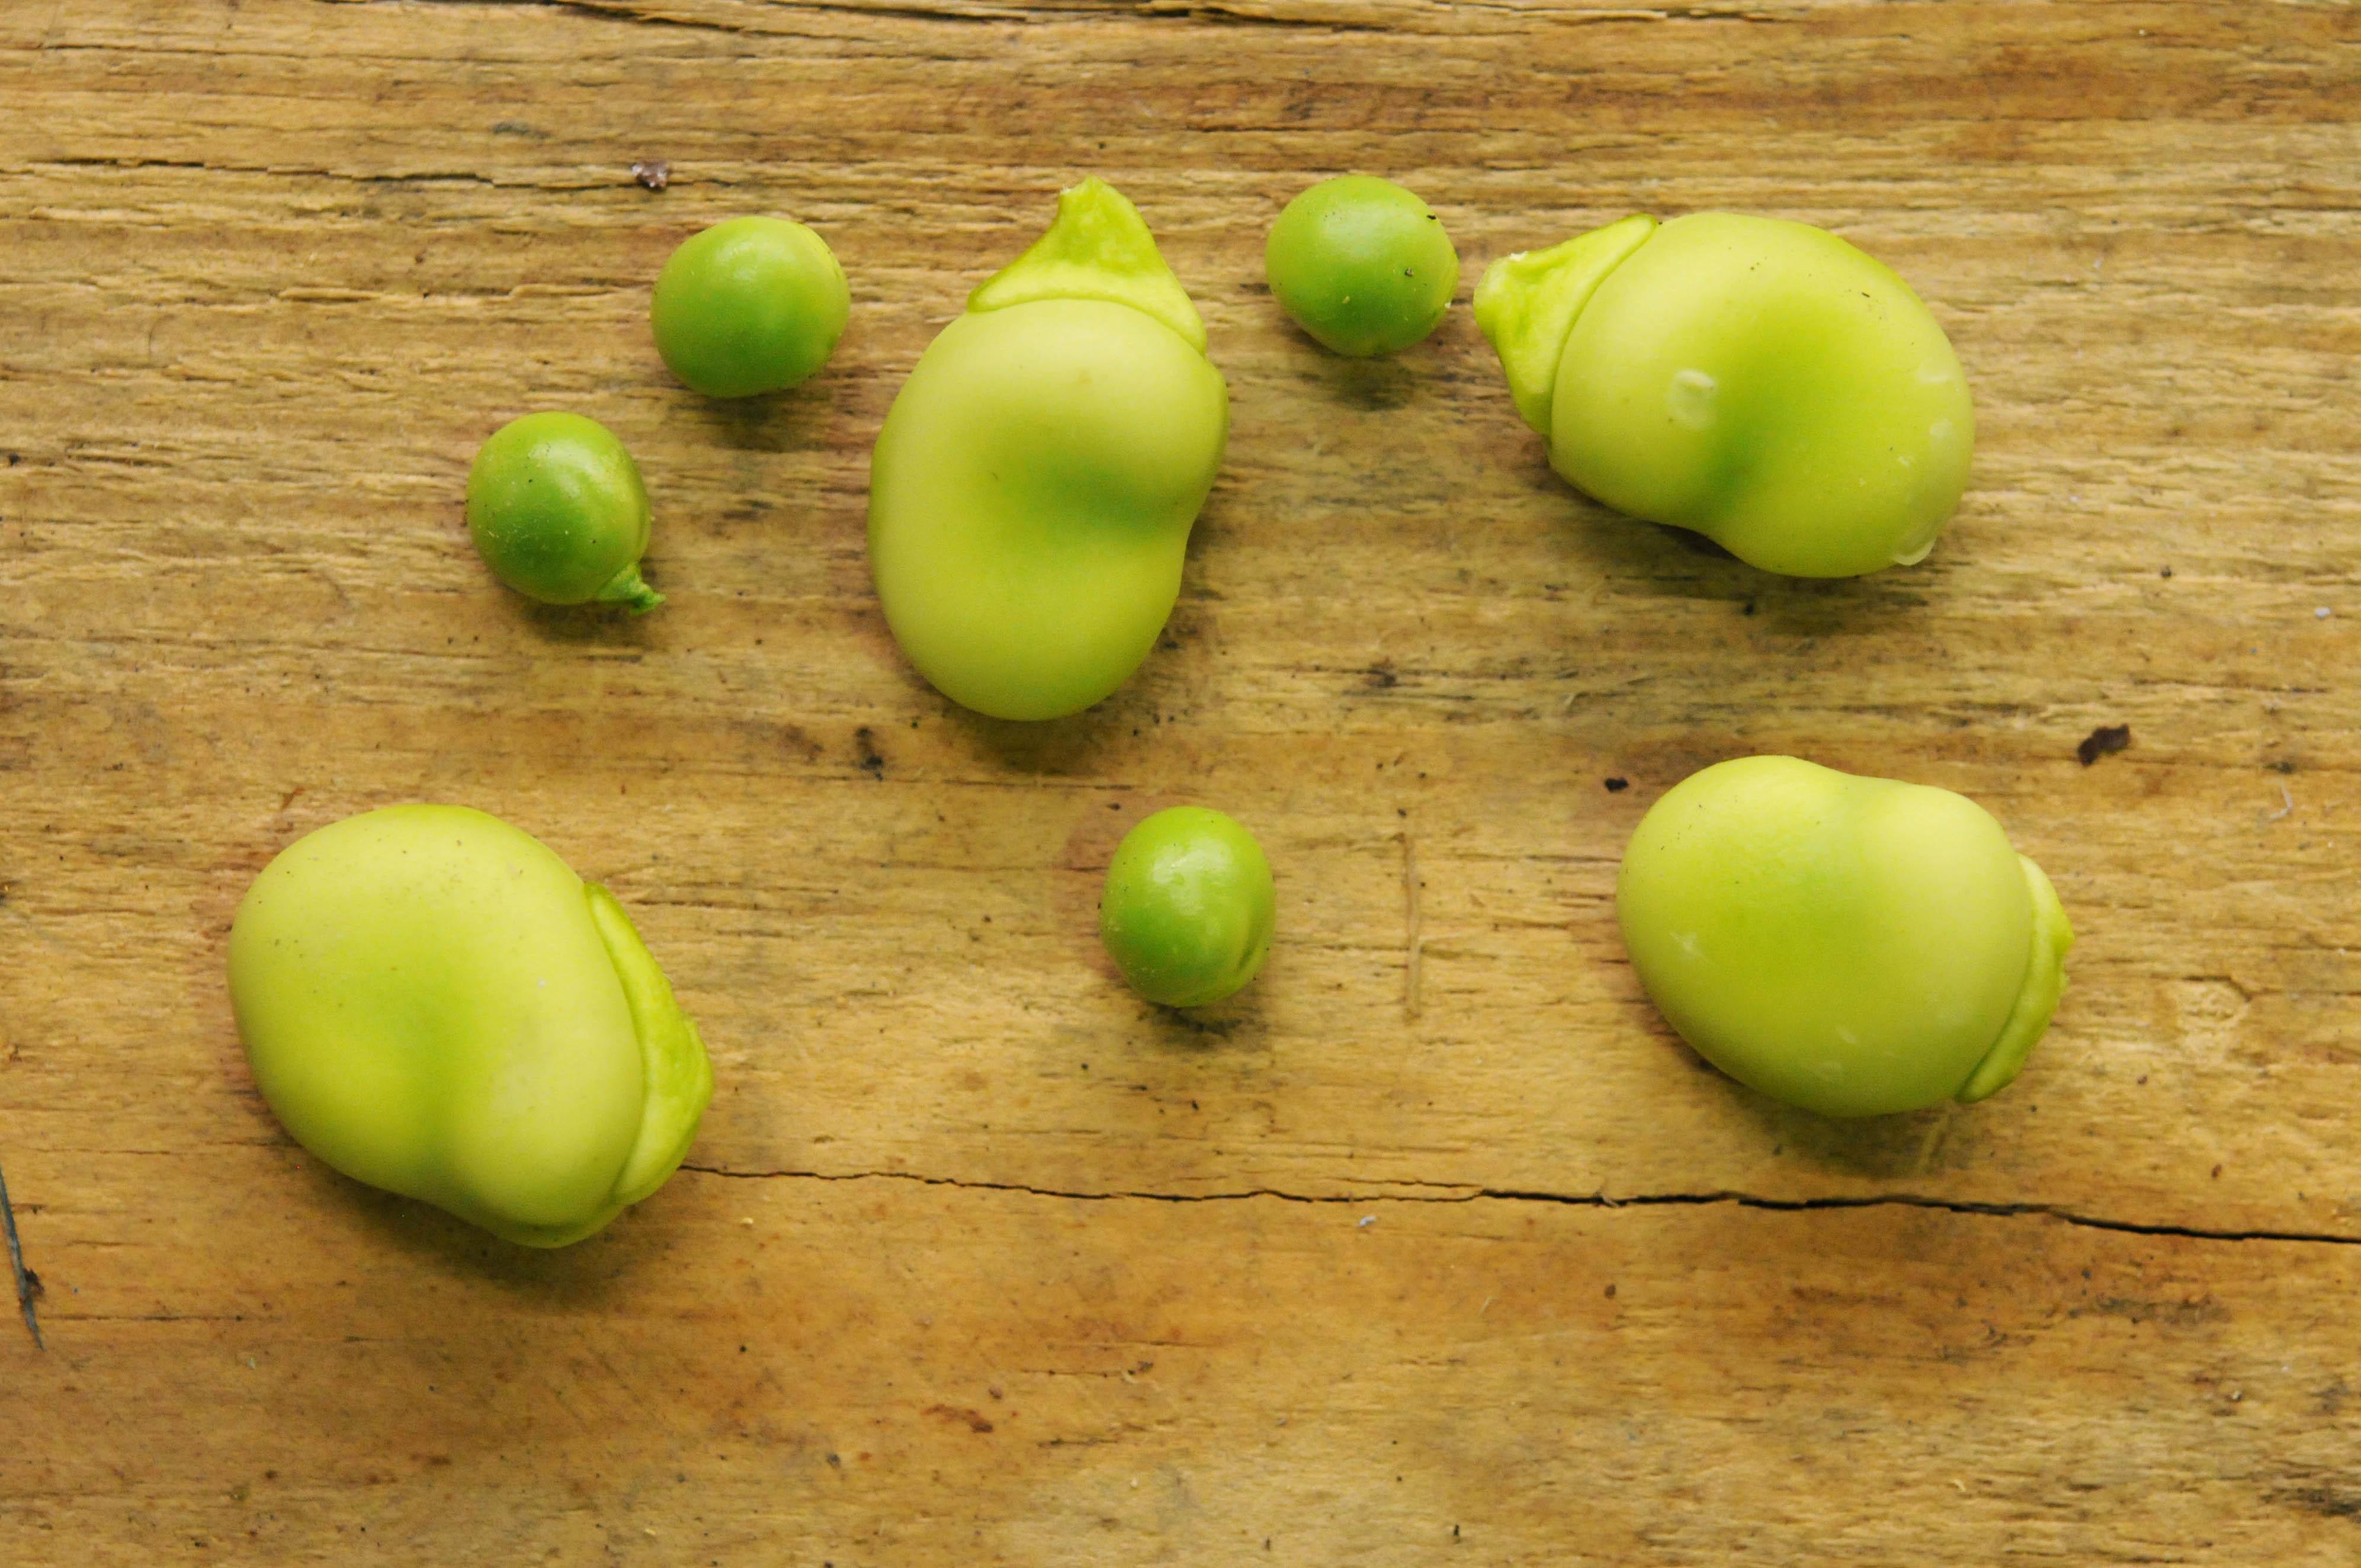 peas-broad-beans.jpg?mtime=20170922135446#asset:11466